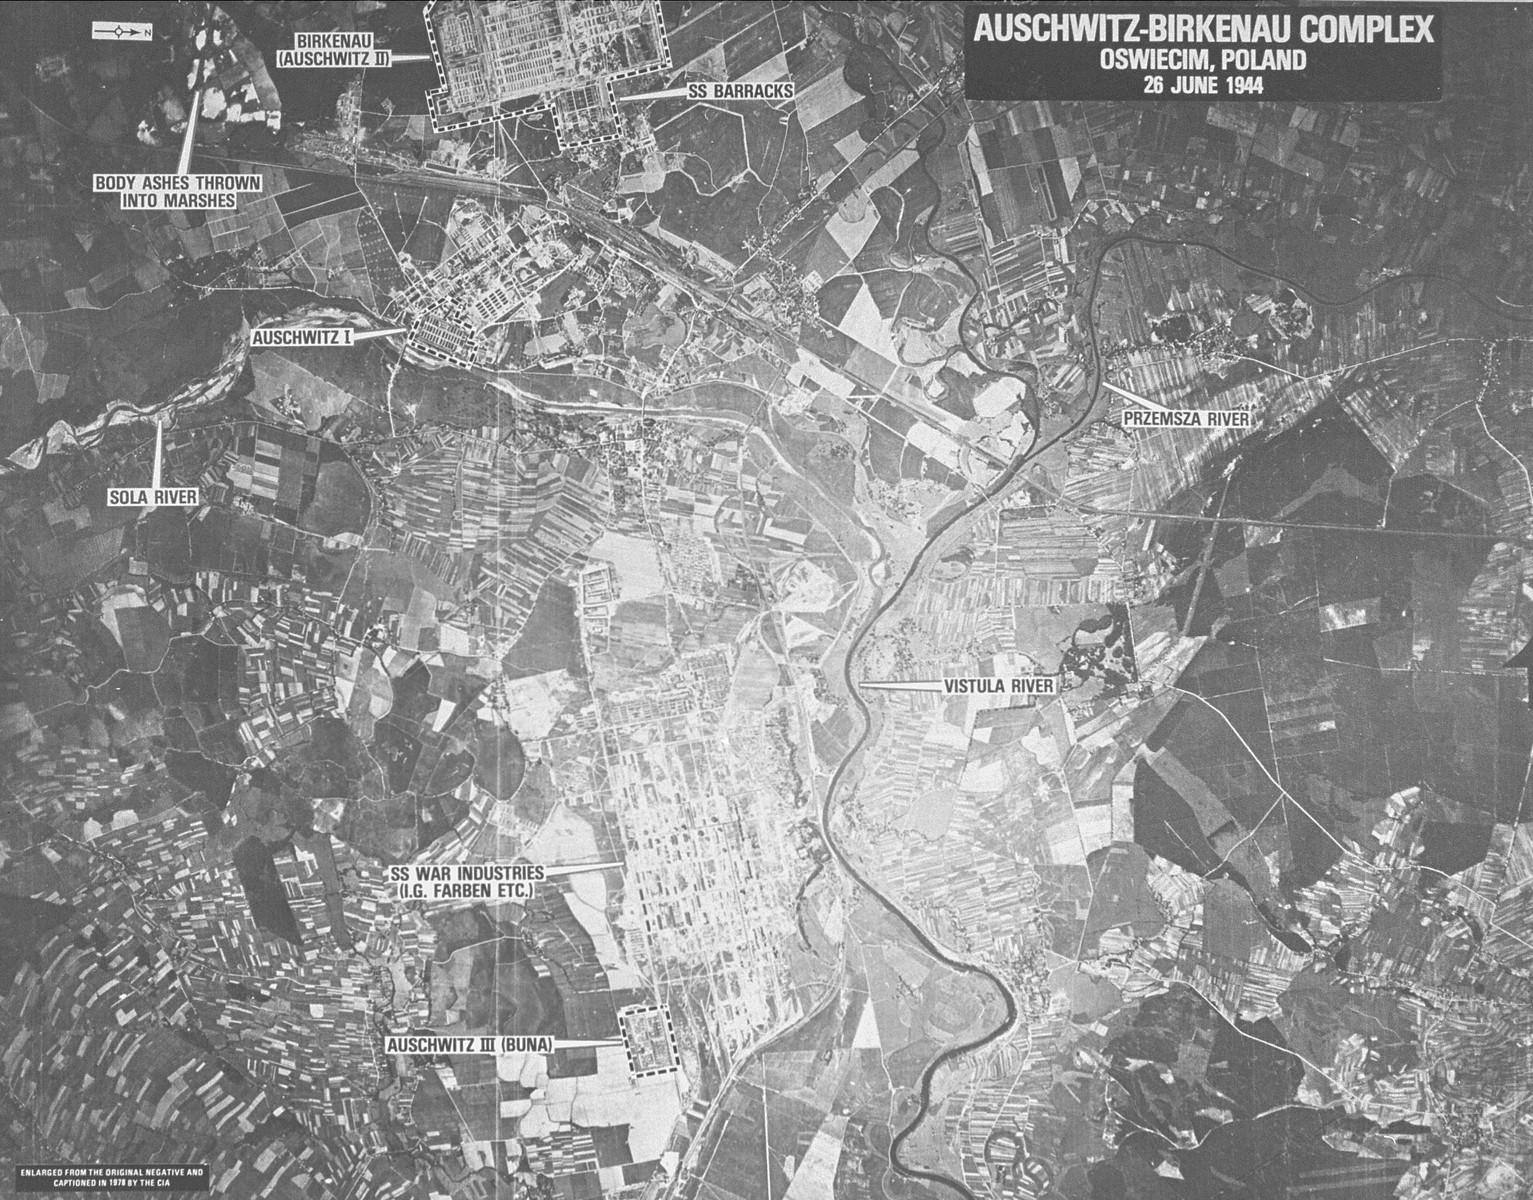 An aerial reconnaissance photograph of Auschwitz II (Birkenau) including Auschwitz III (Monowitz) and the I.G. Farben Buna plant.